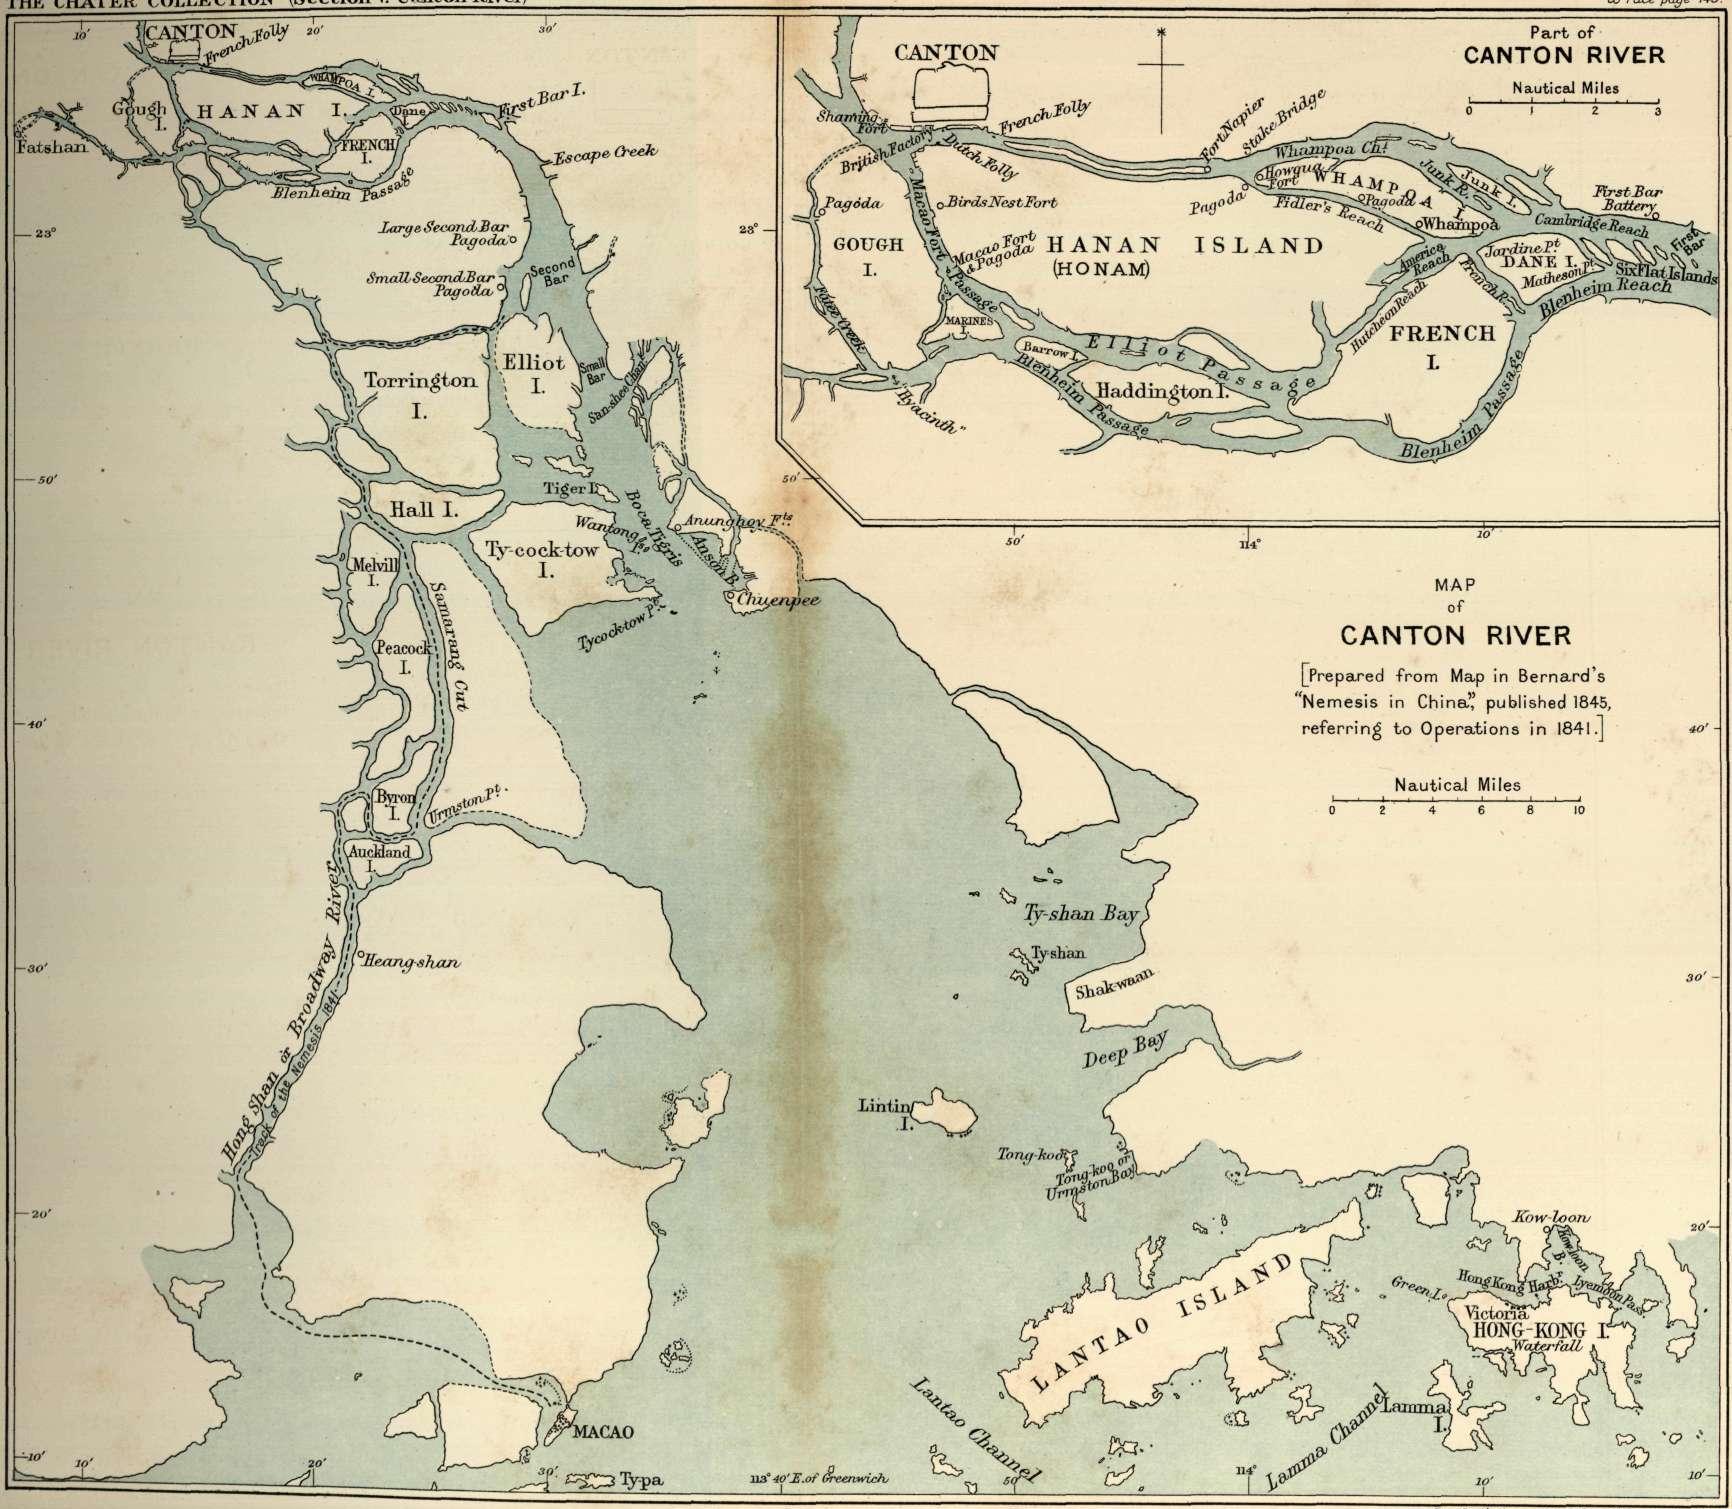 FileMap of Canton Riverjpg Wikimedia Commons